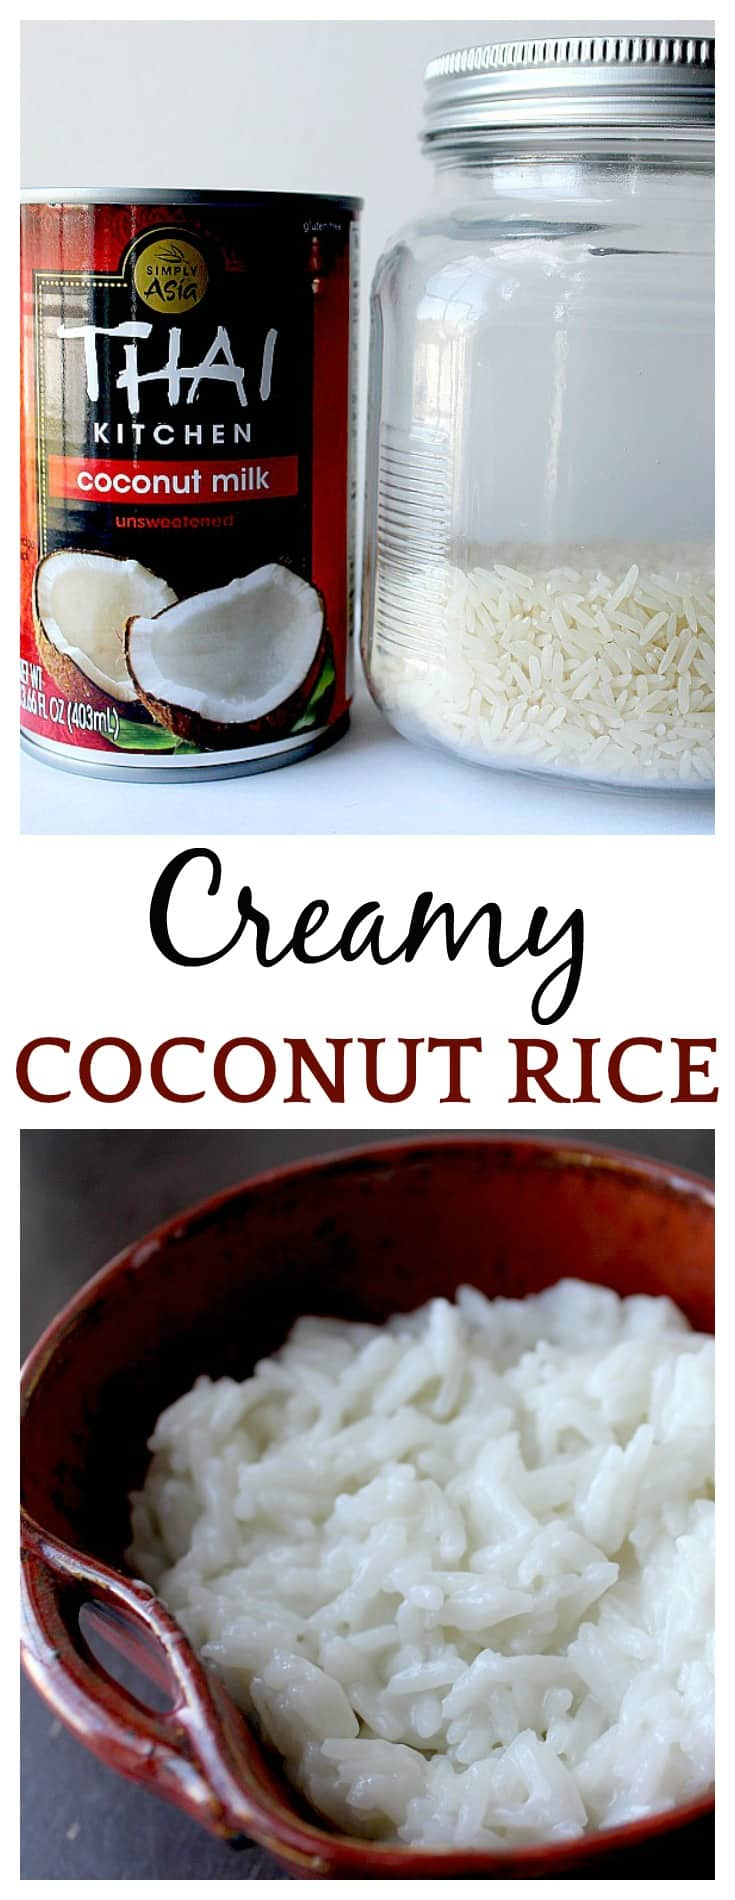 Creamy Foods Make Me Sick